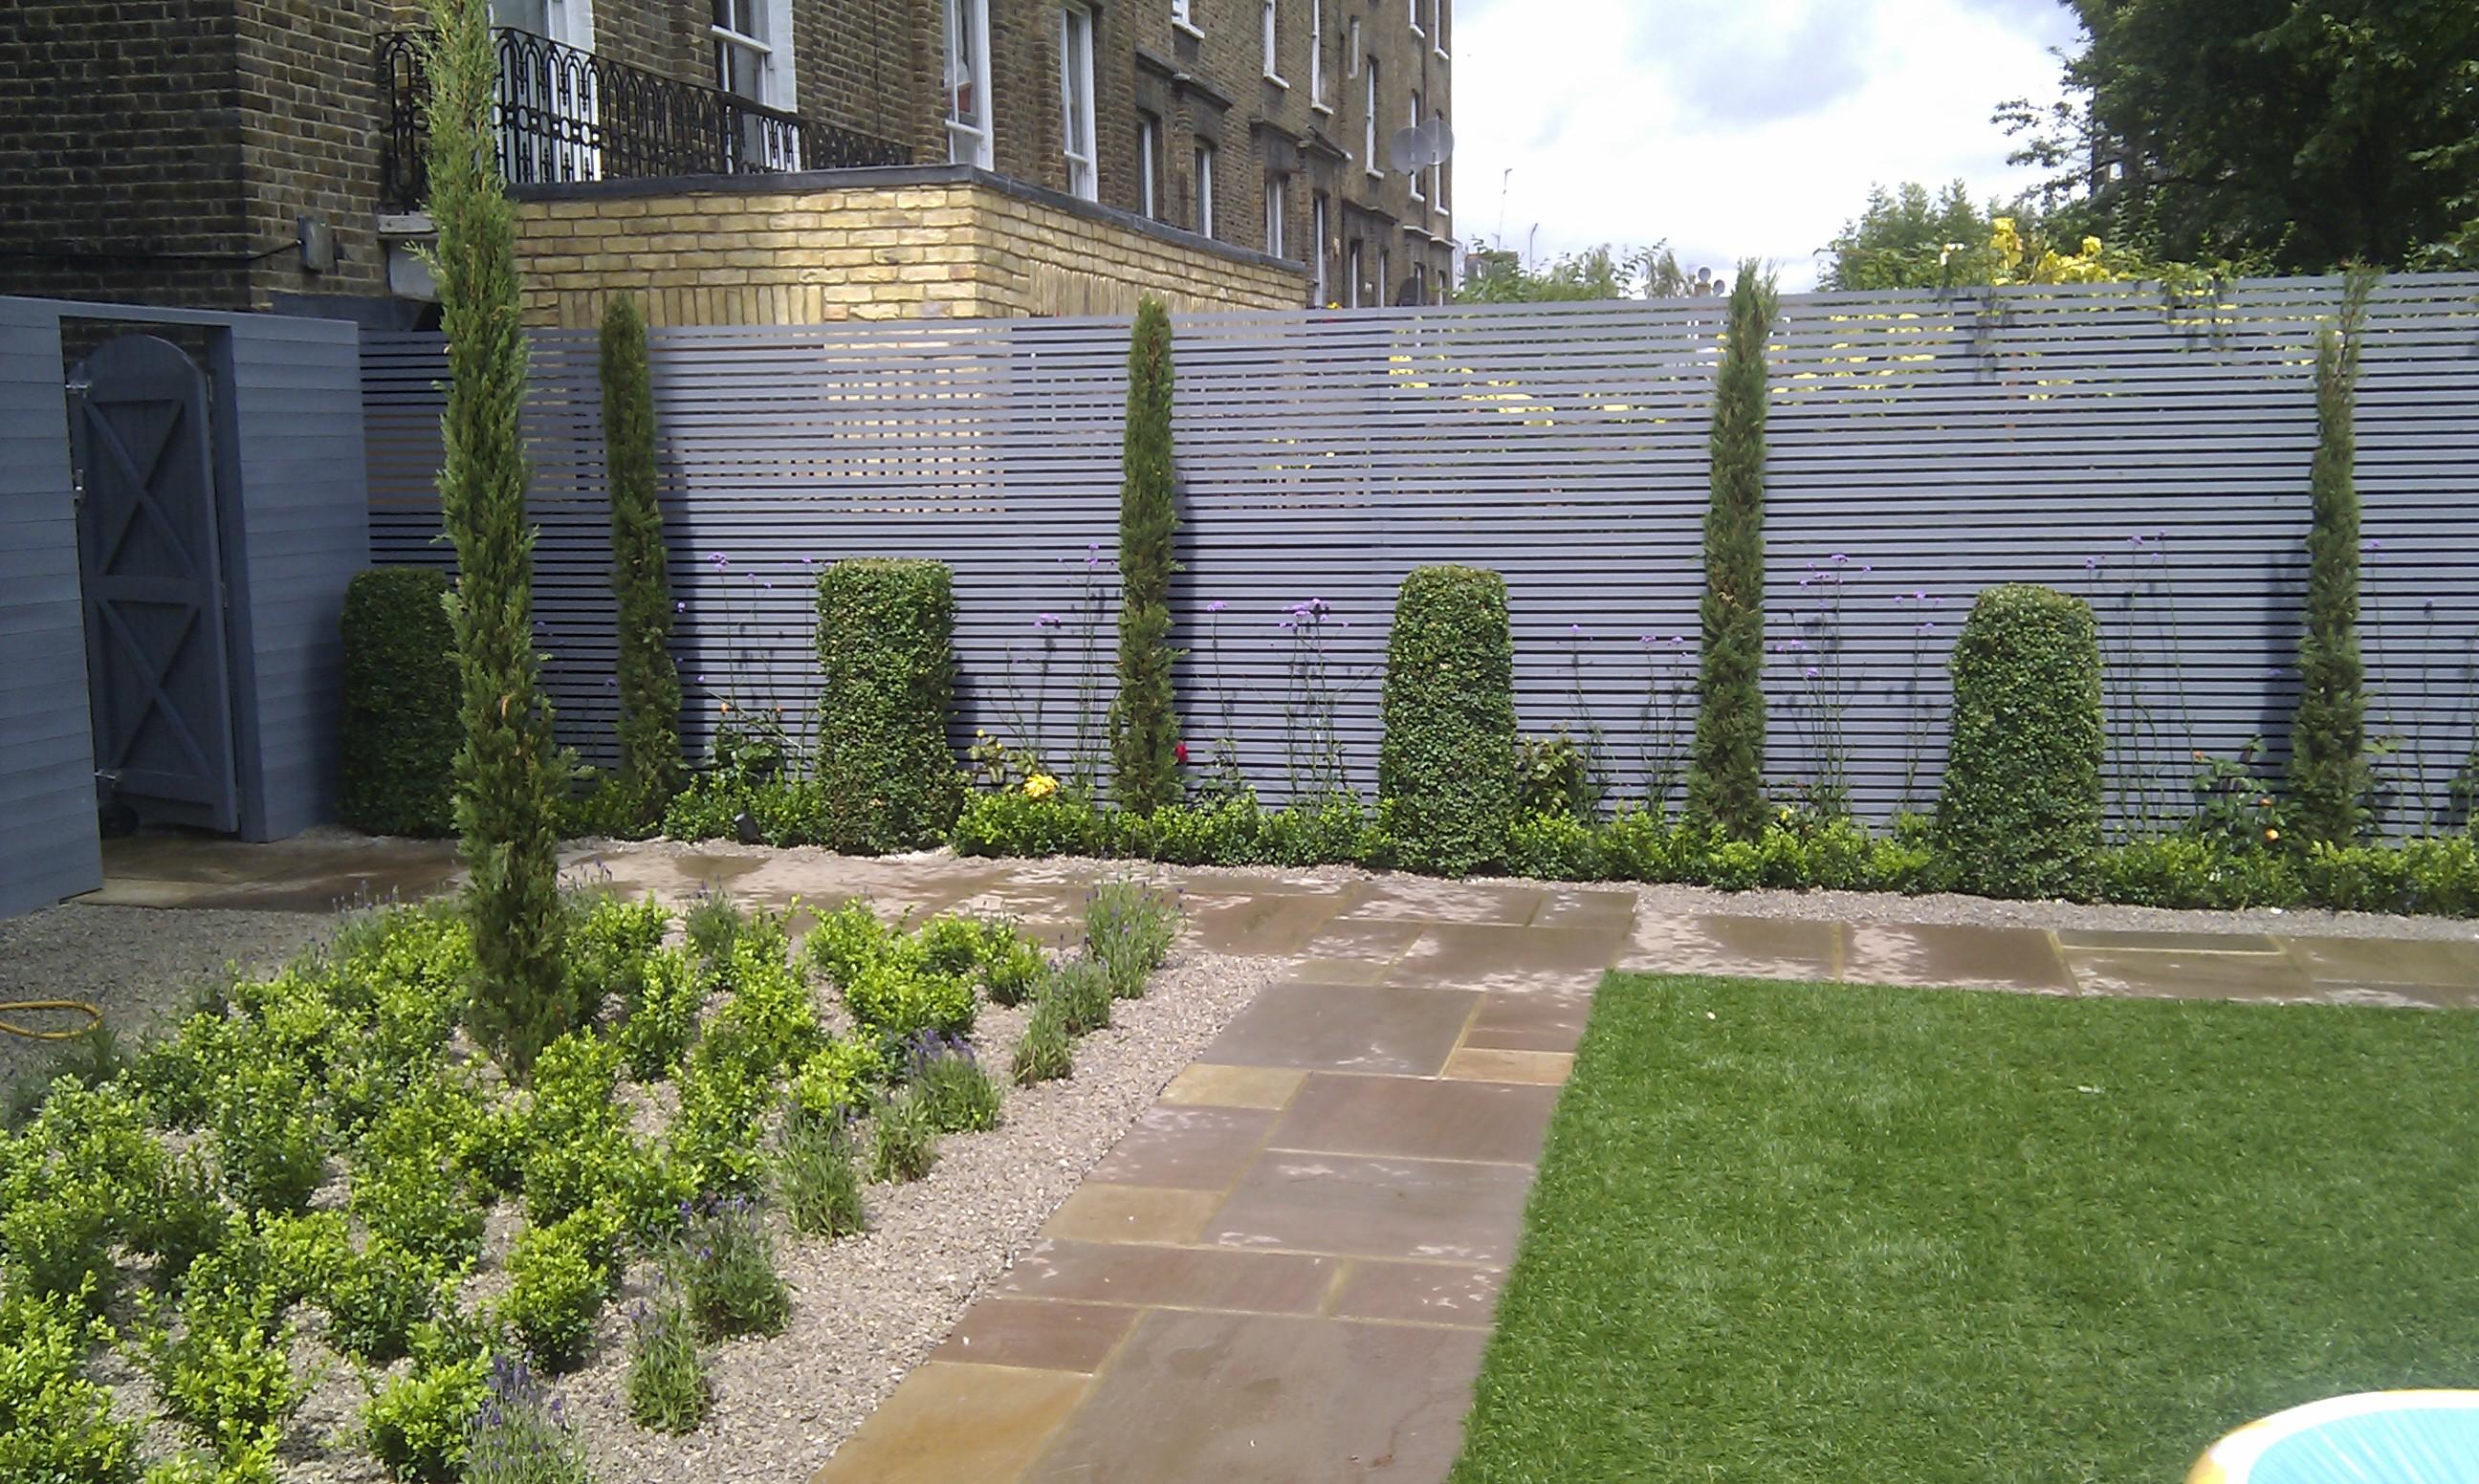 modern garden design london slatted grey privacy screen sandstone paving easy grass balau hardwood decking (3)